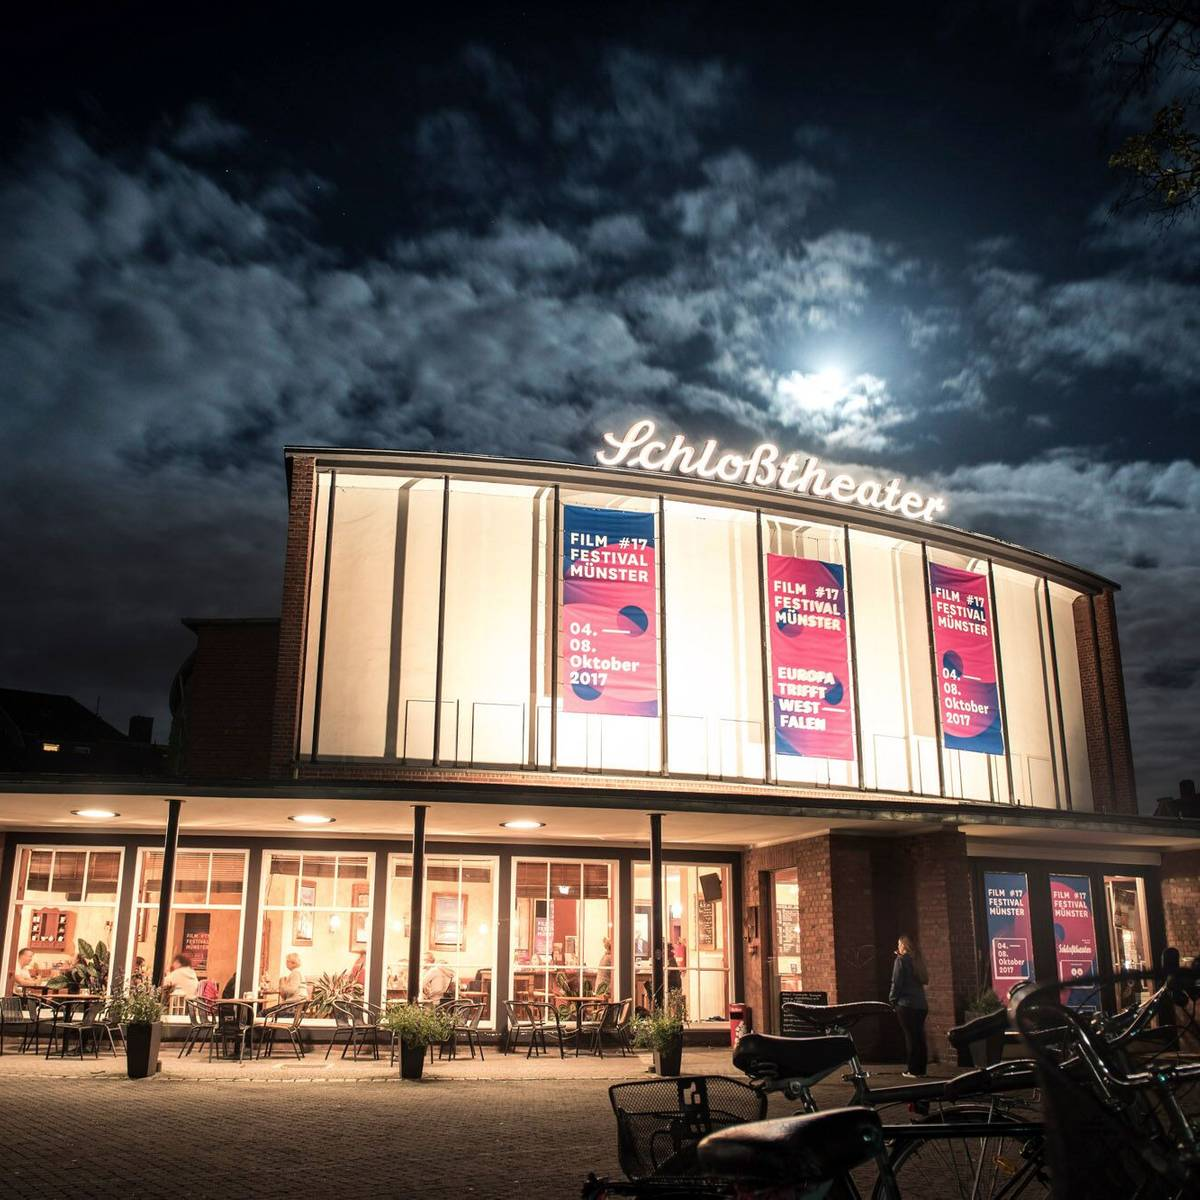 Kino Schlosstheater Münster